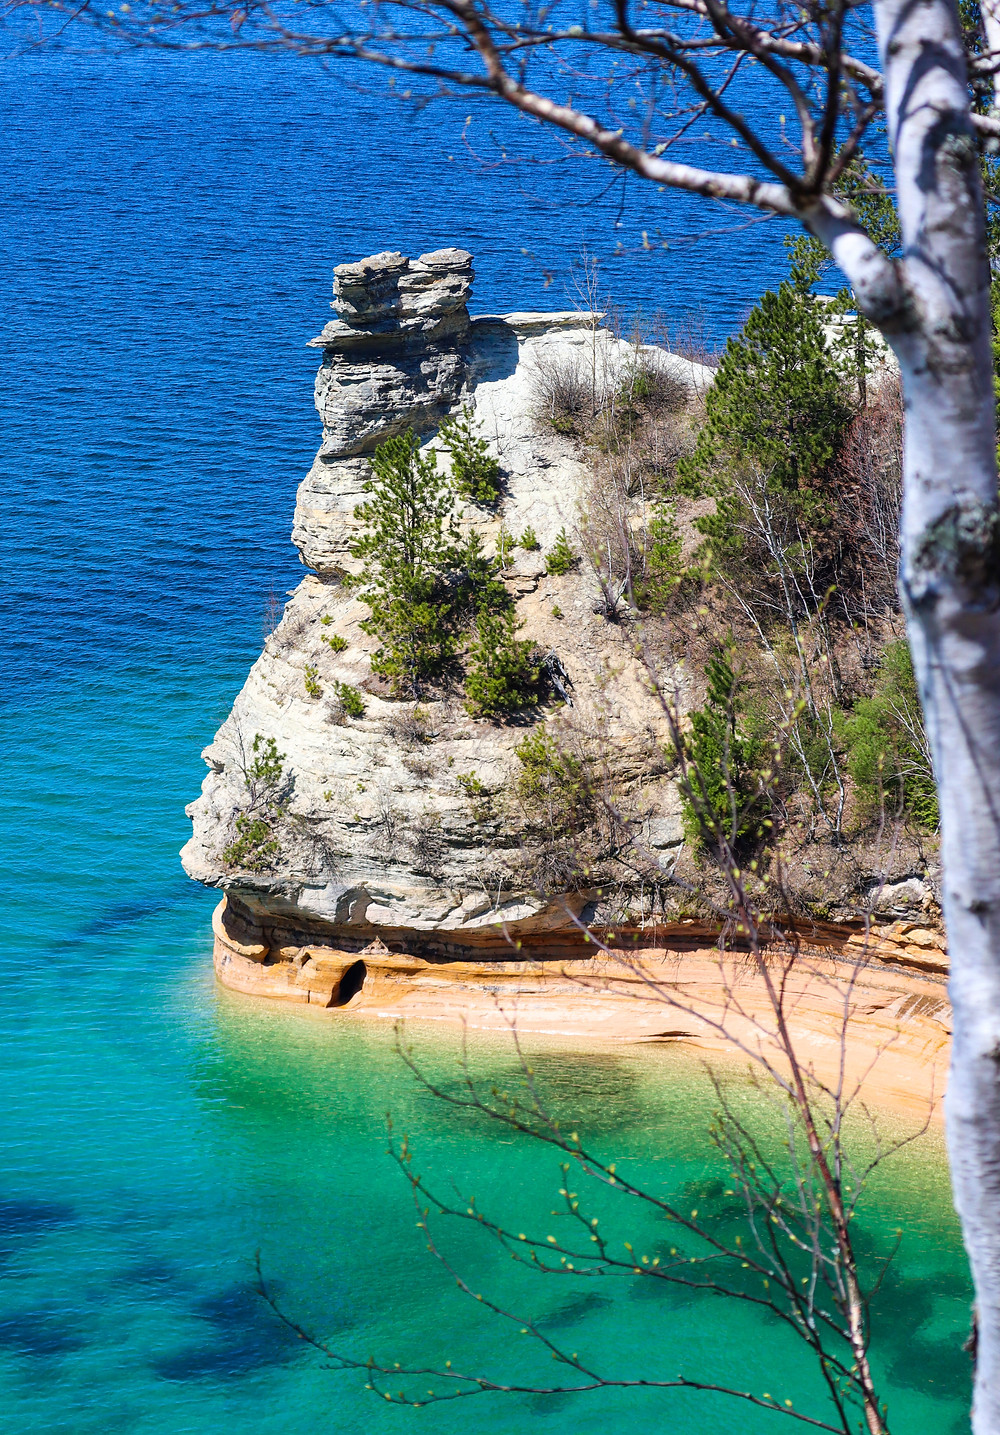 Overlook of Pictured Rocks